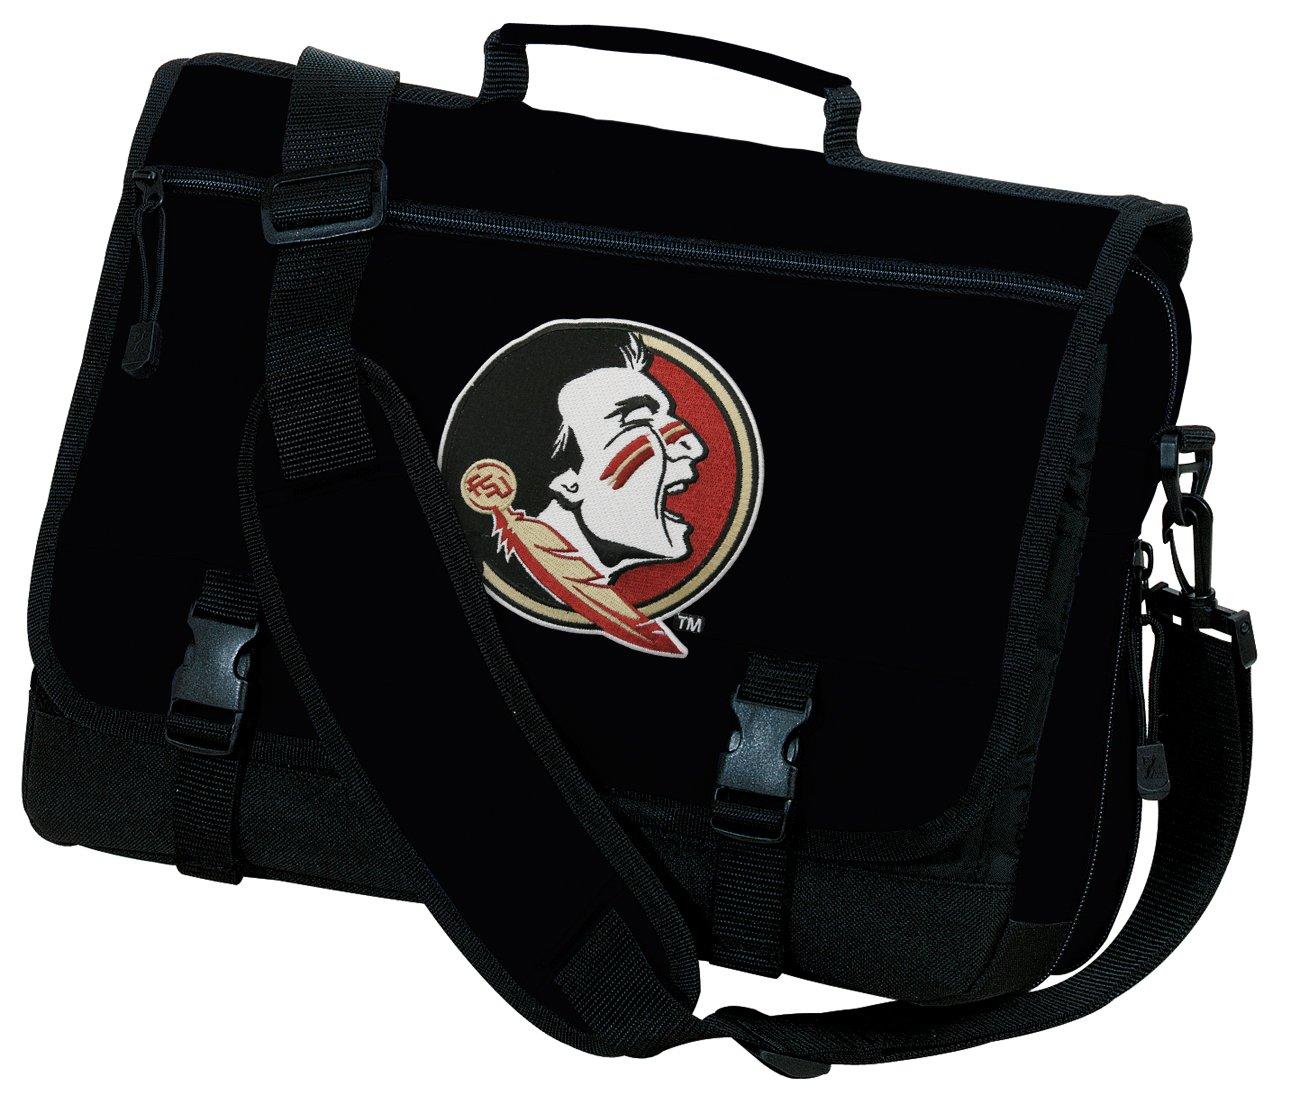 Amazon.com : Florida State University Laptop Bag FSU Computer Bag ...